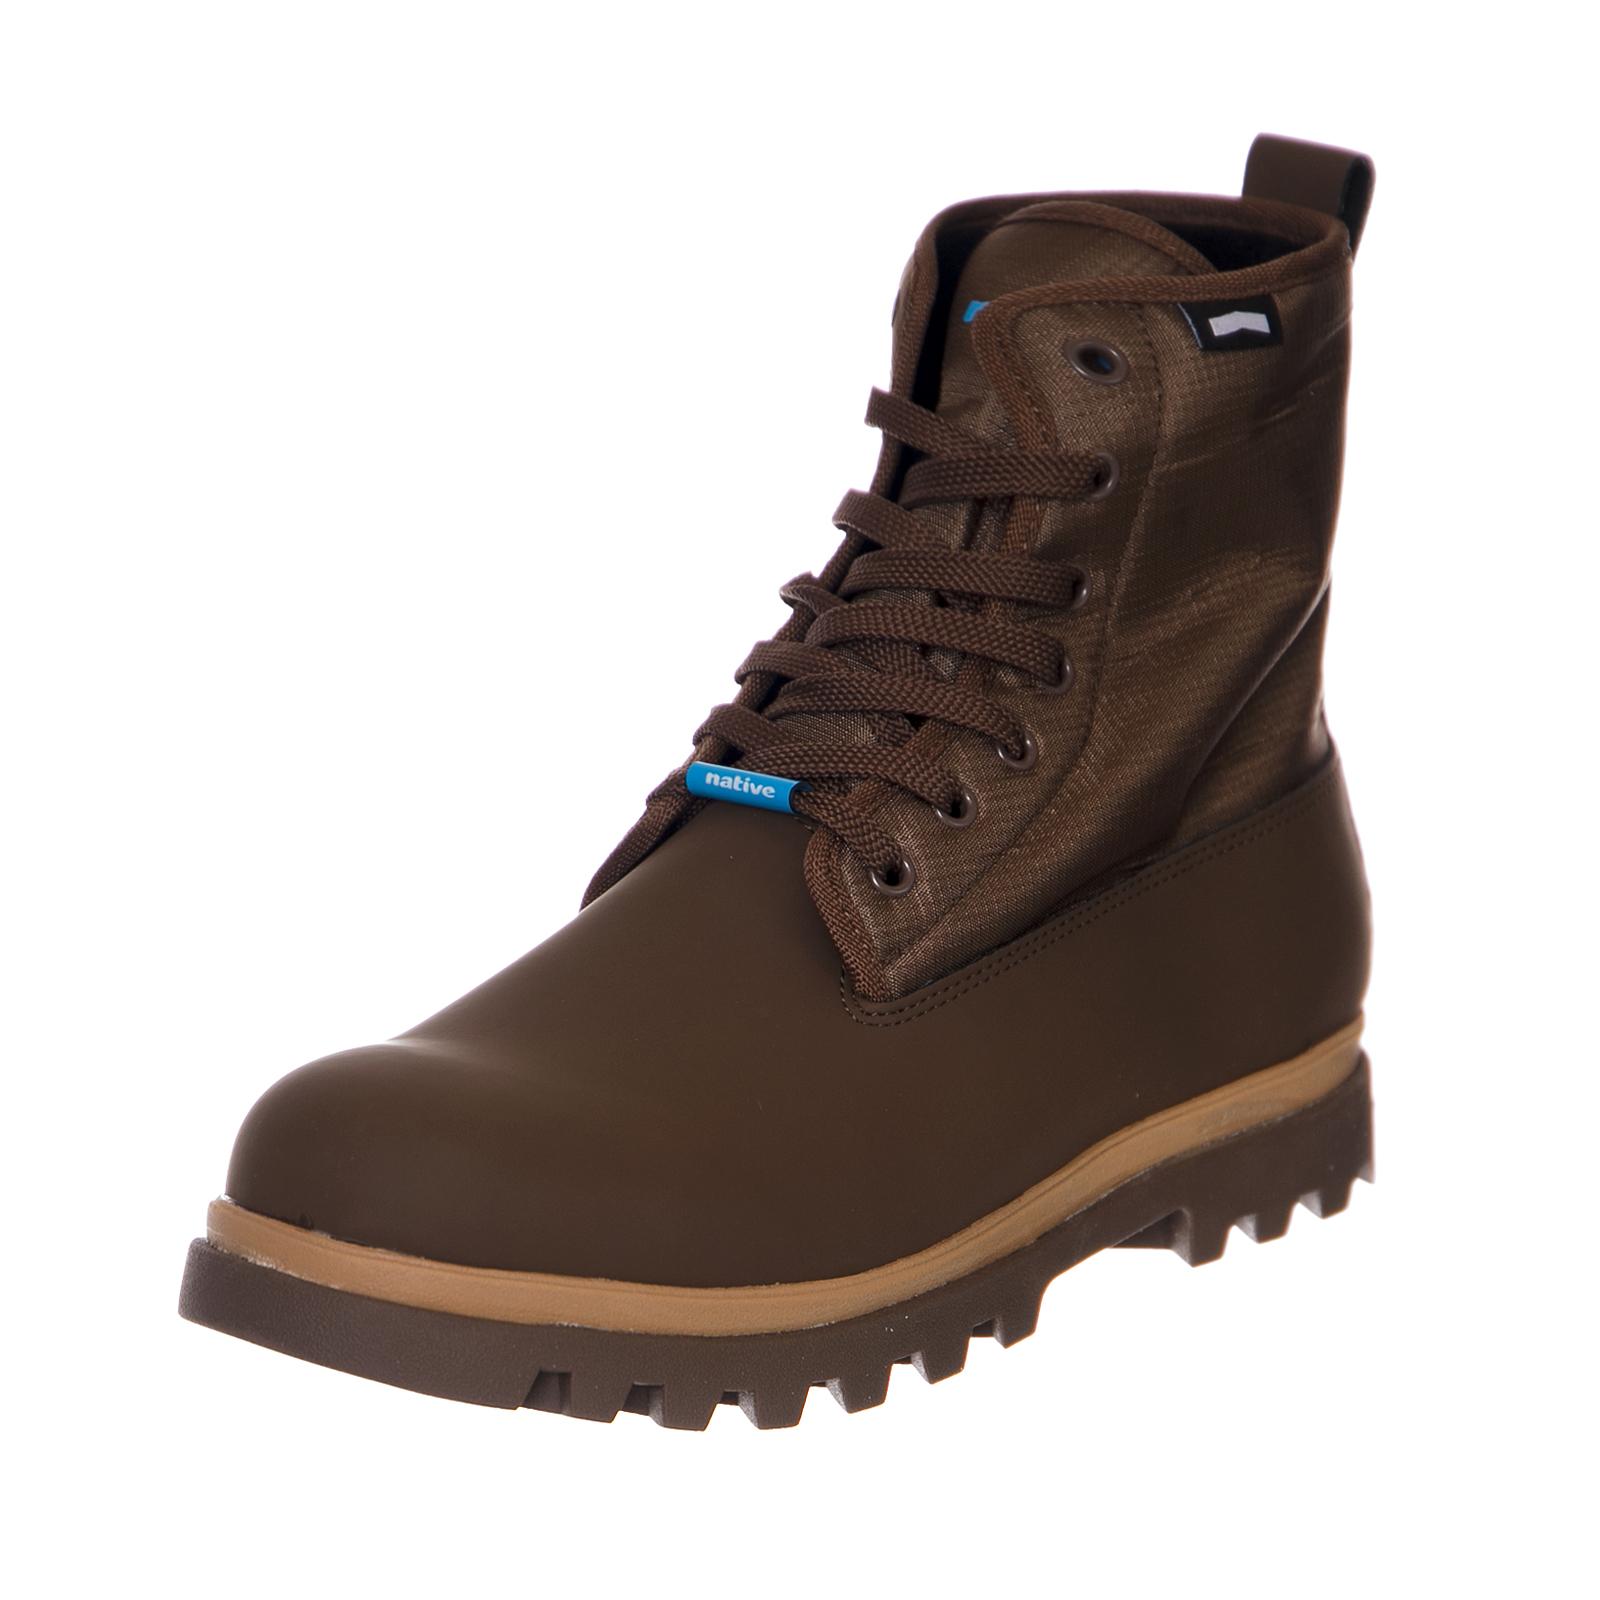 Treklite Marrone howler native Brown Sneakers Marrone Johnny Howler SqAzpvx